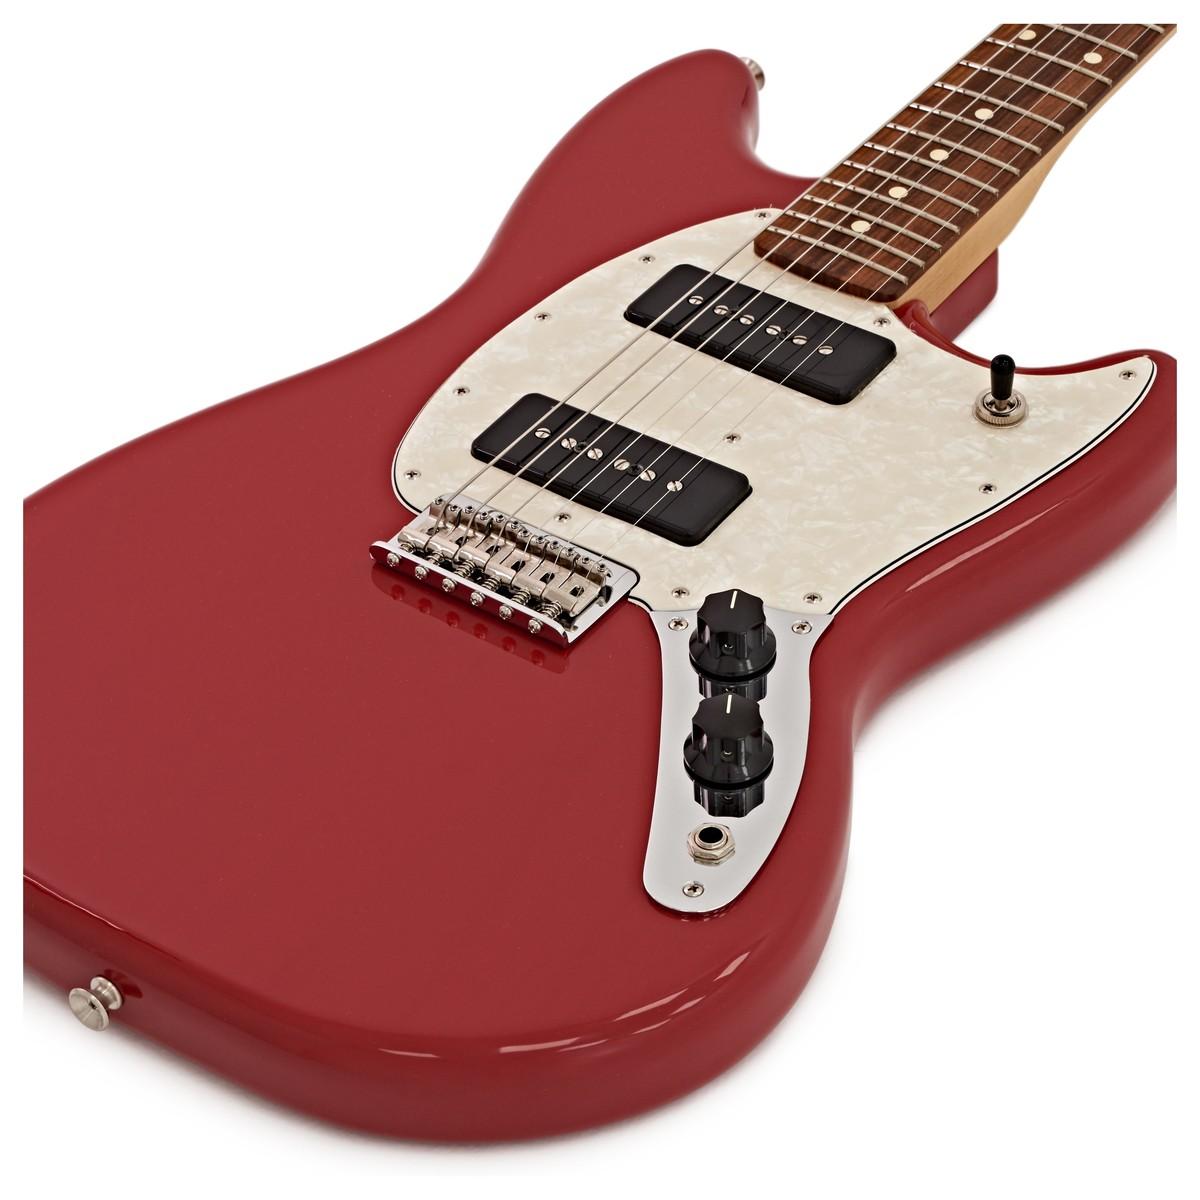 Fender mustang 90 electric guitar pau ferro torino red loading zoom